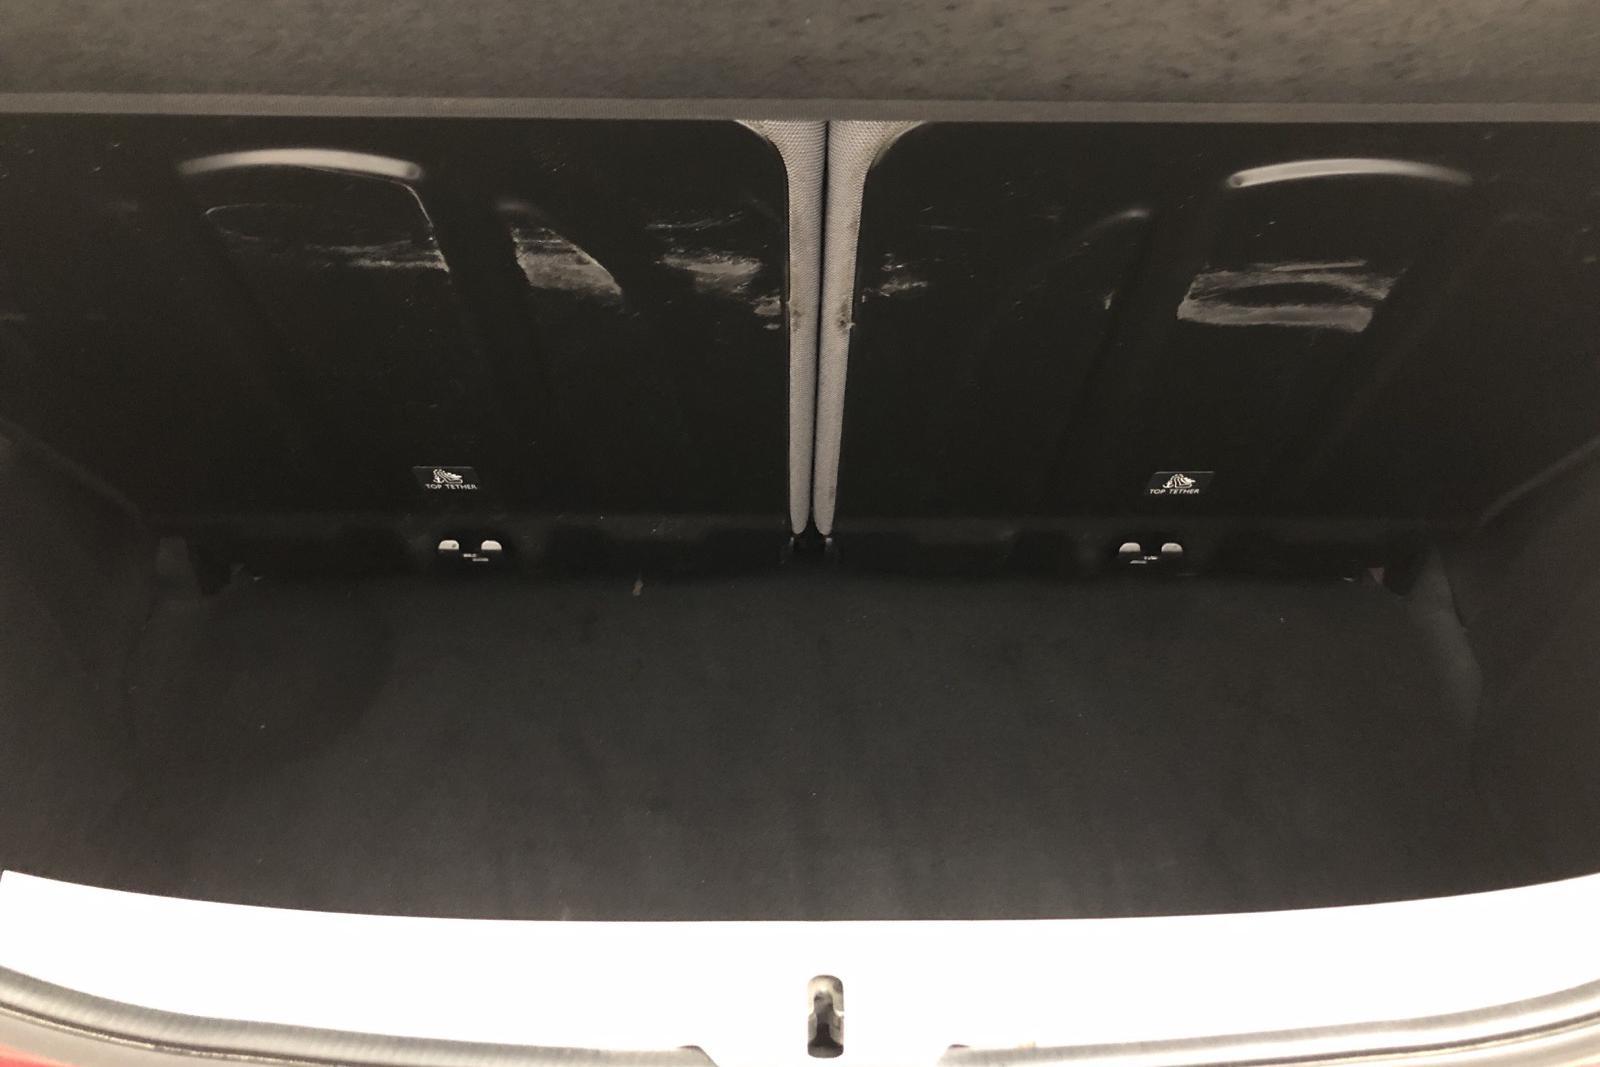 Toyota Aygo 1.0 5dr (72hk) - 5 618 mil - Automat - röd - 2019